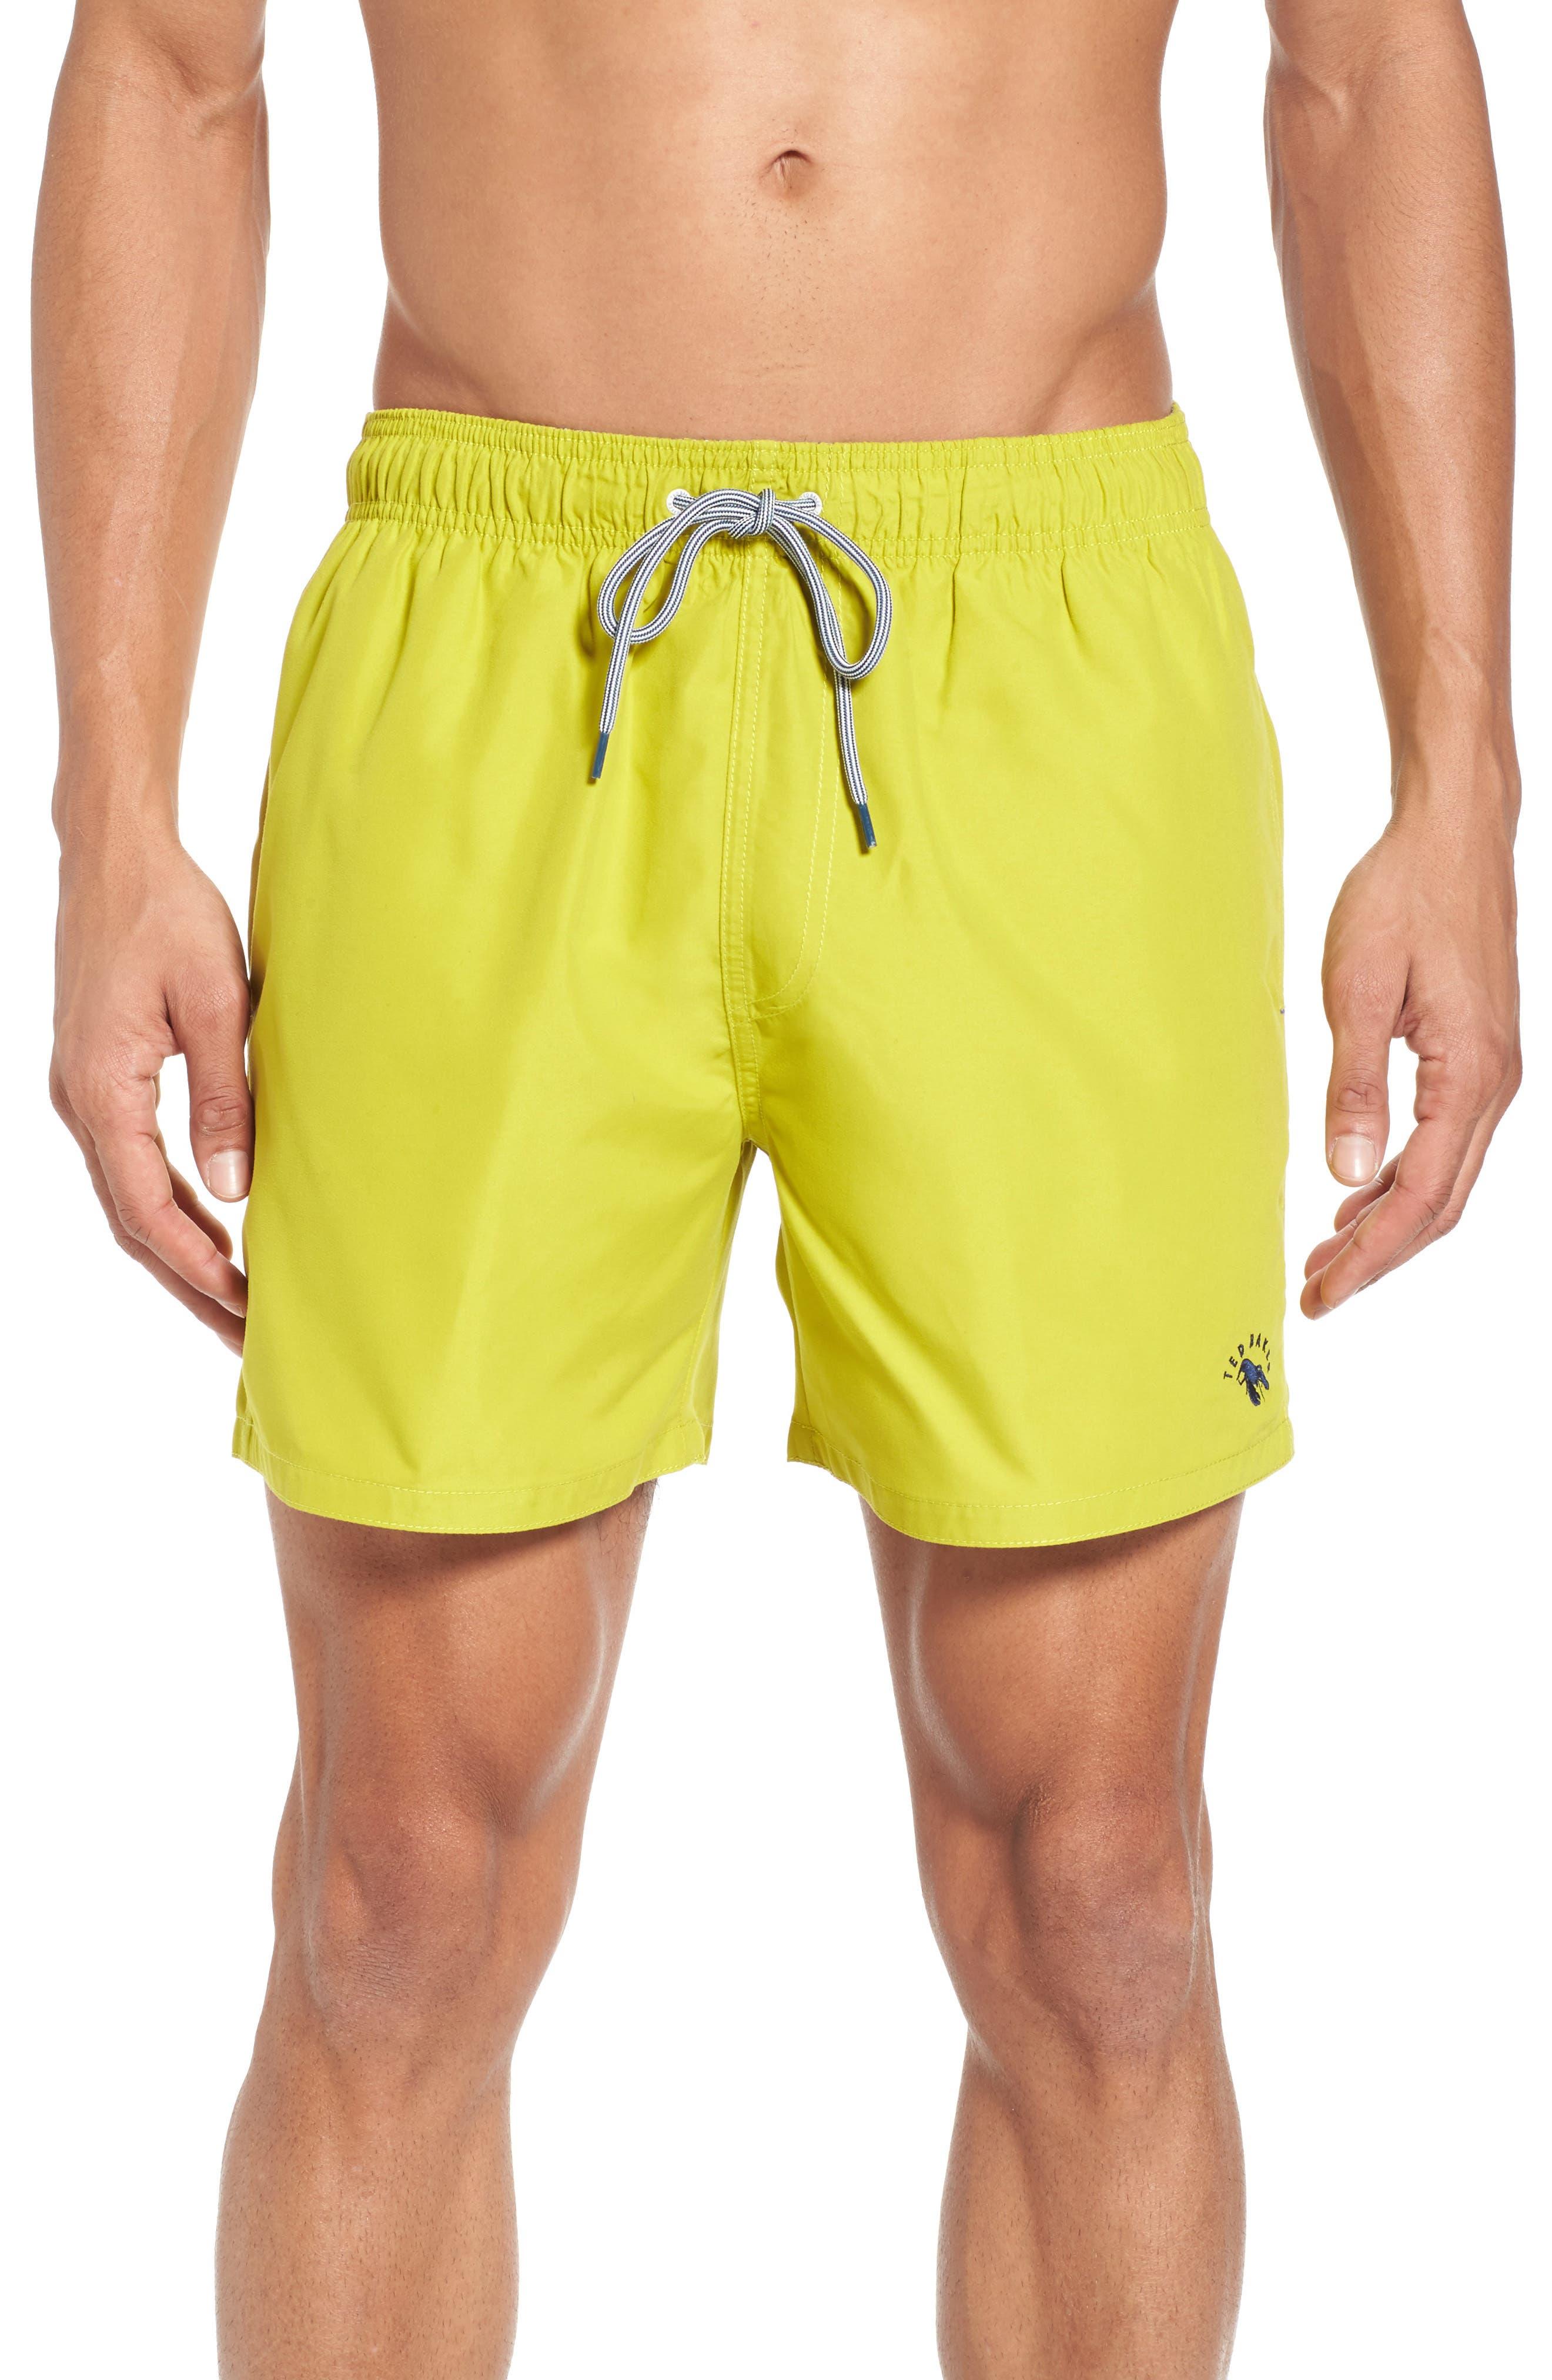 Danbury Swim Shorts,                             Main thumbnail 1, color,                             303